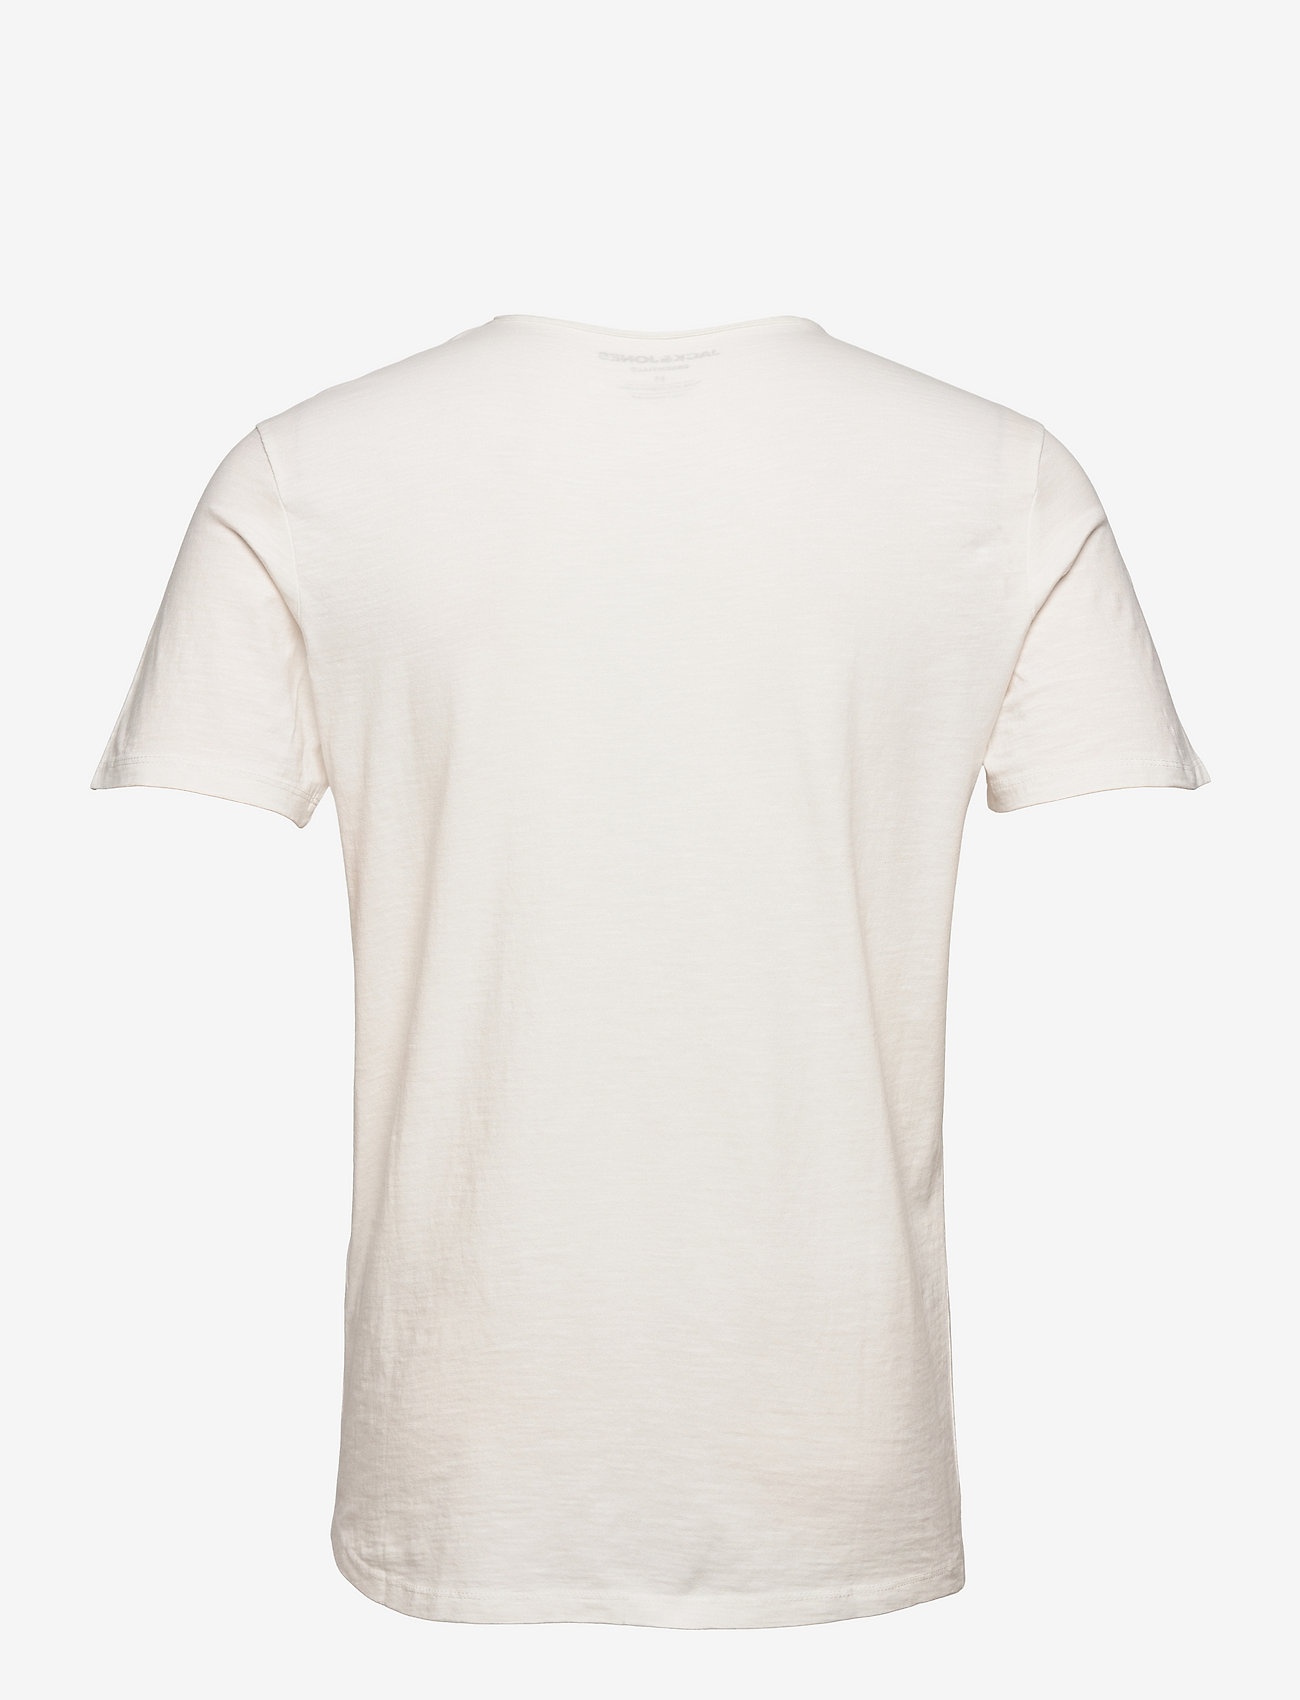 Jack & Jones - JJEBASHER TEE O-NECK SS - basic t-shirts - cloud dancer - 1